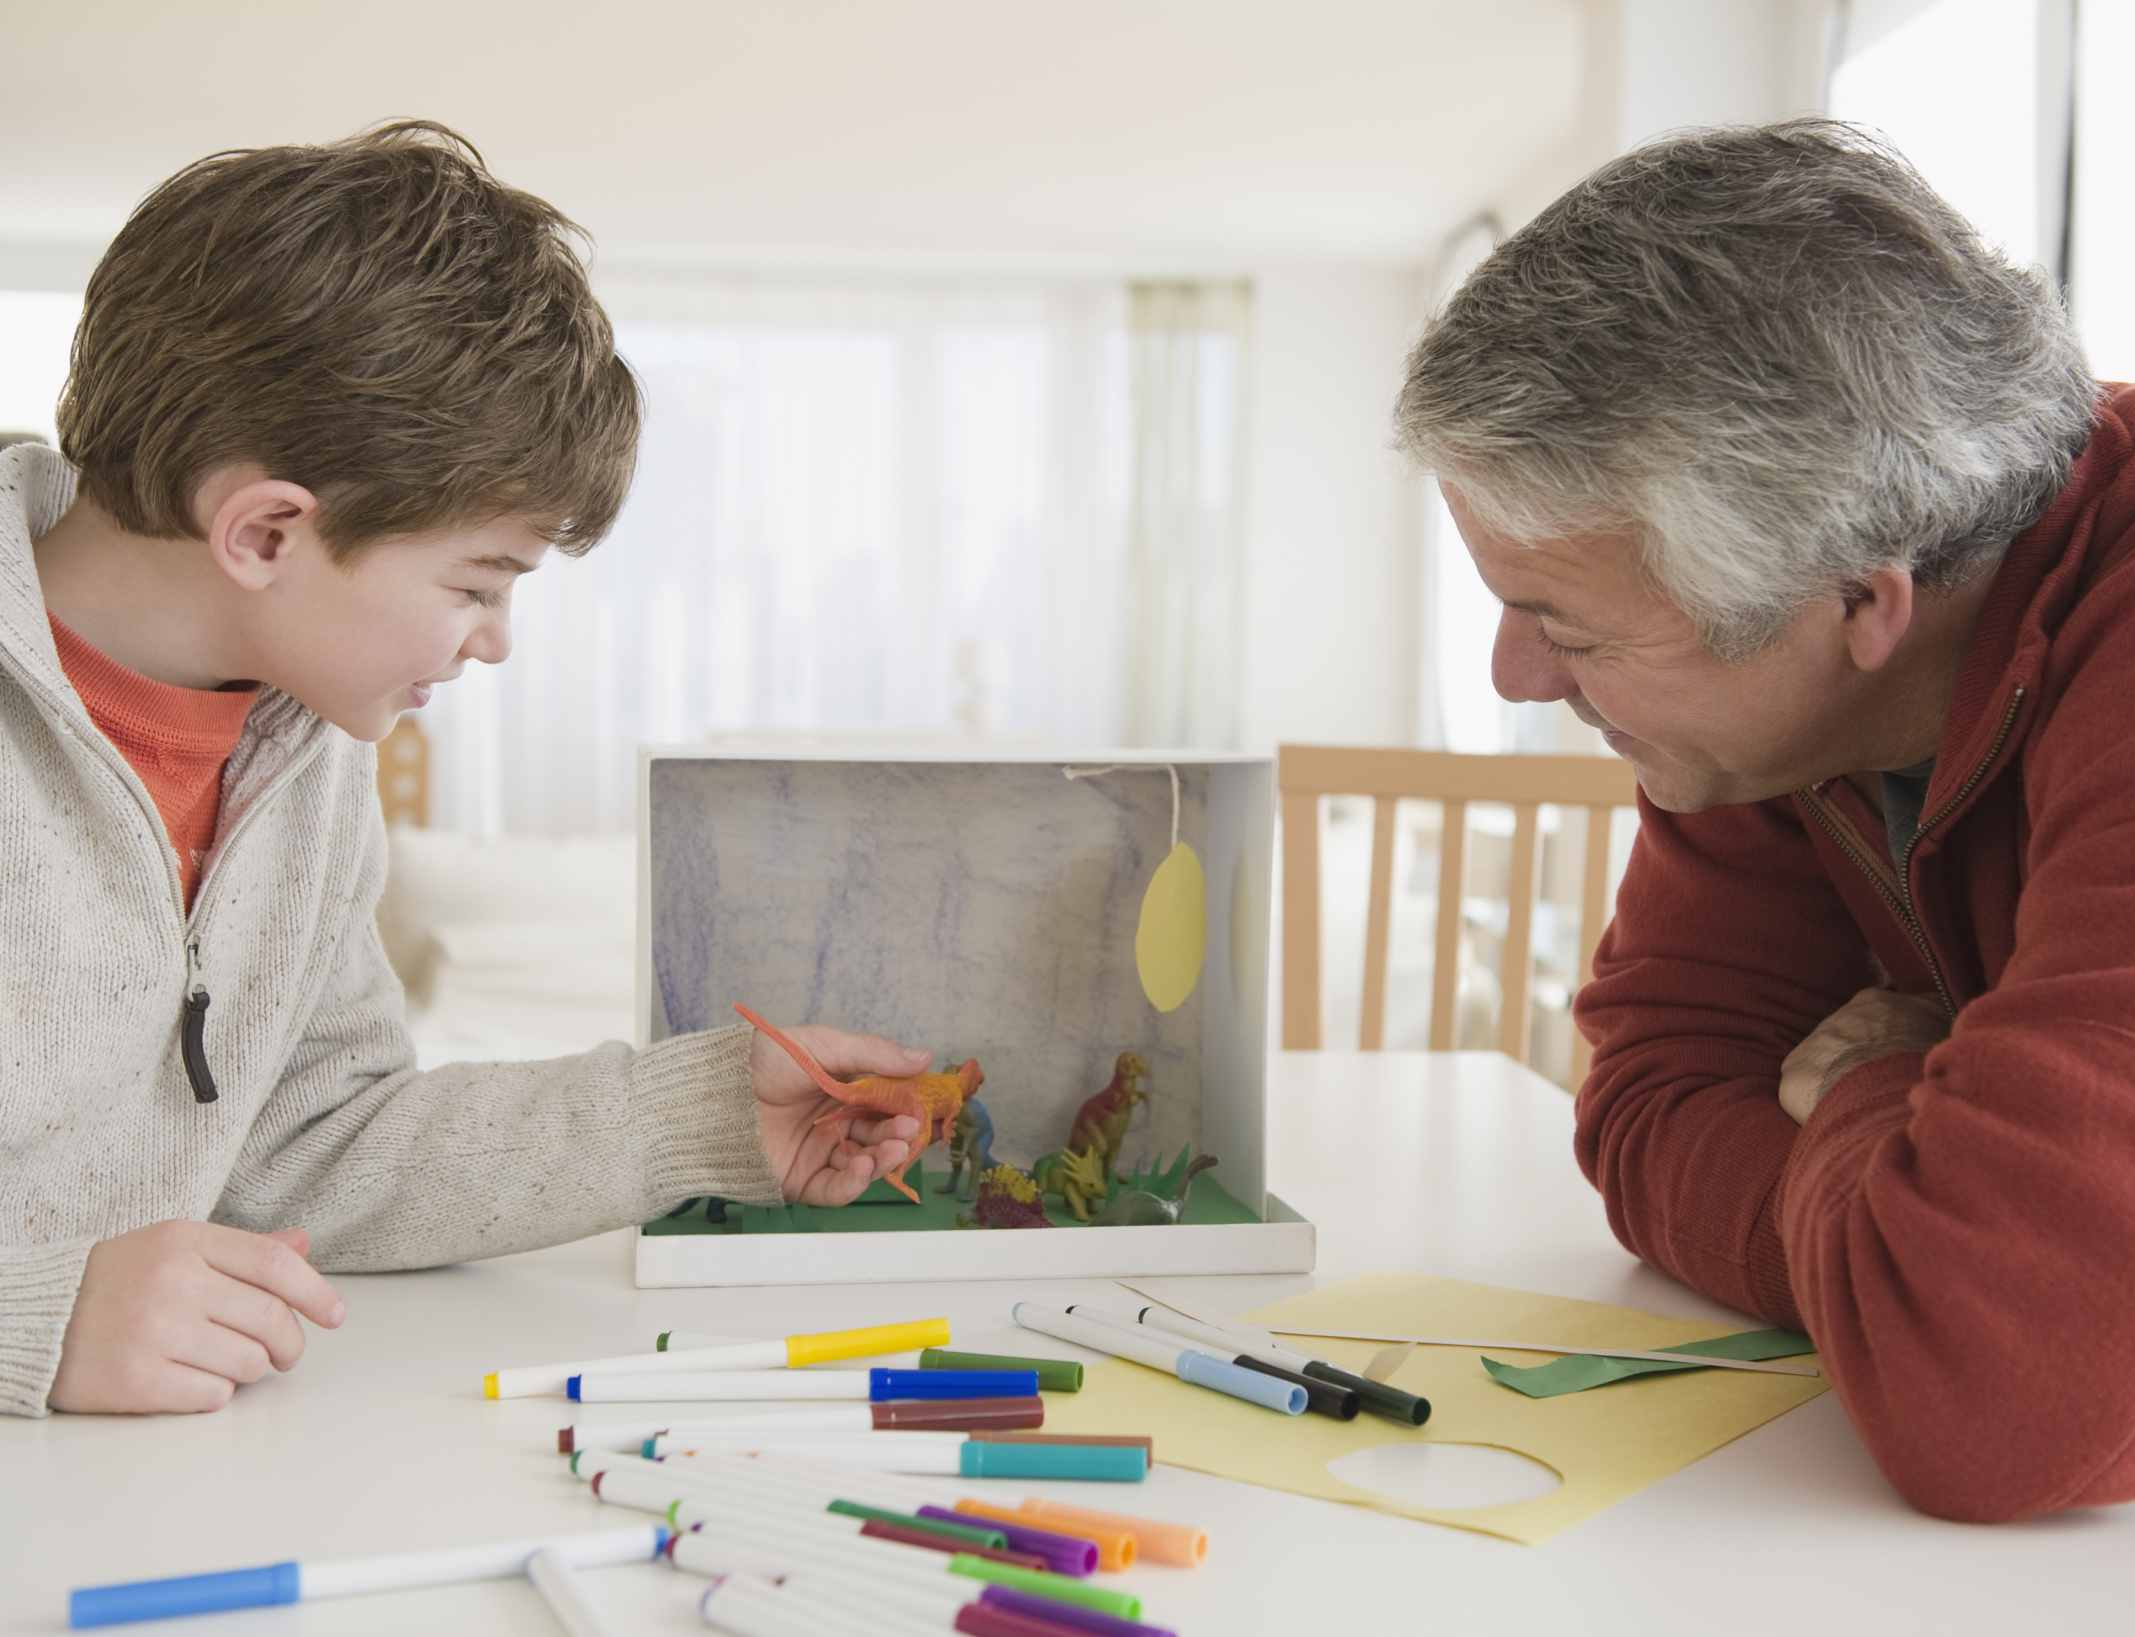 Make a diorama with a grandchild